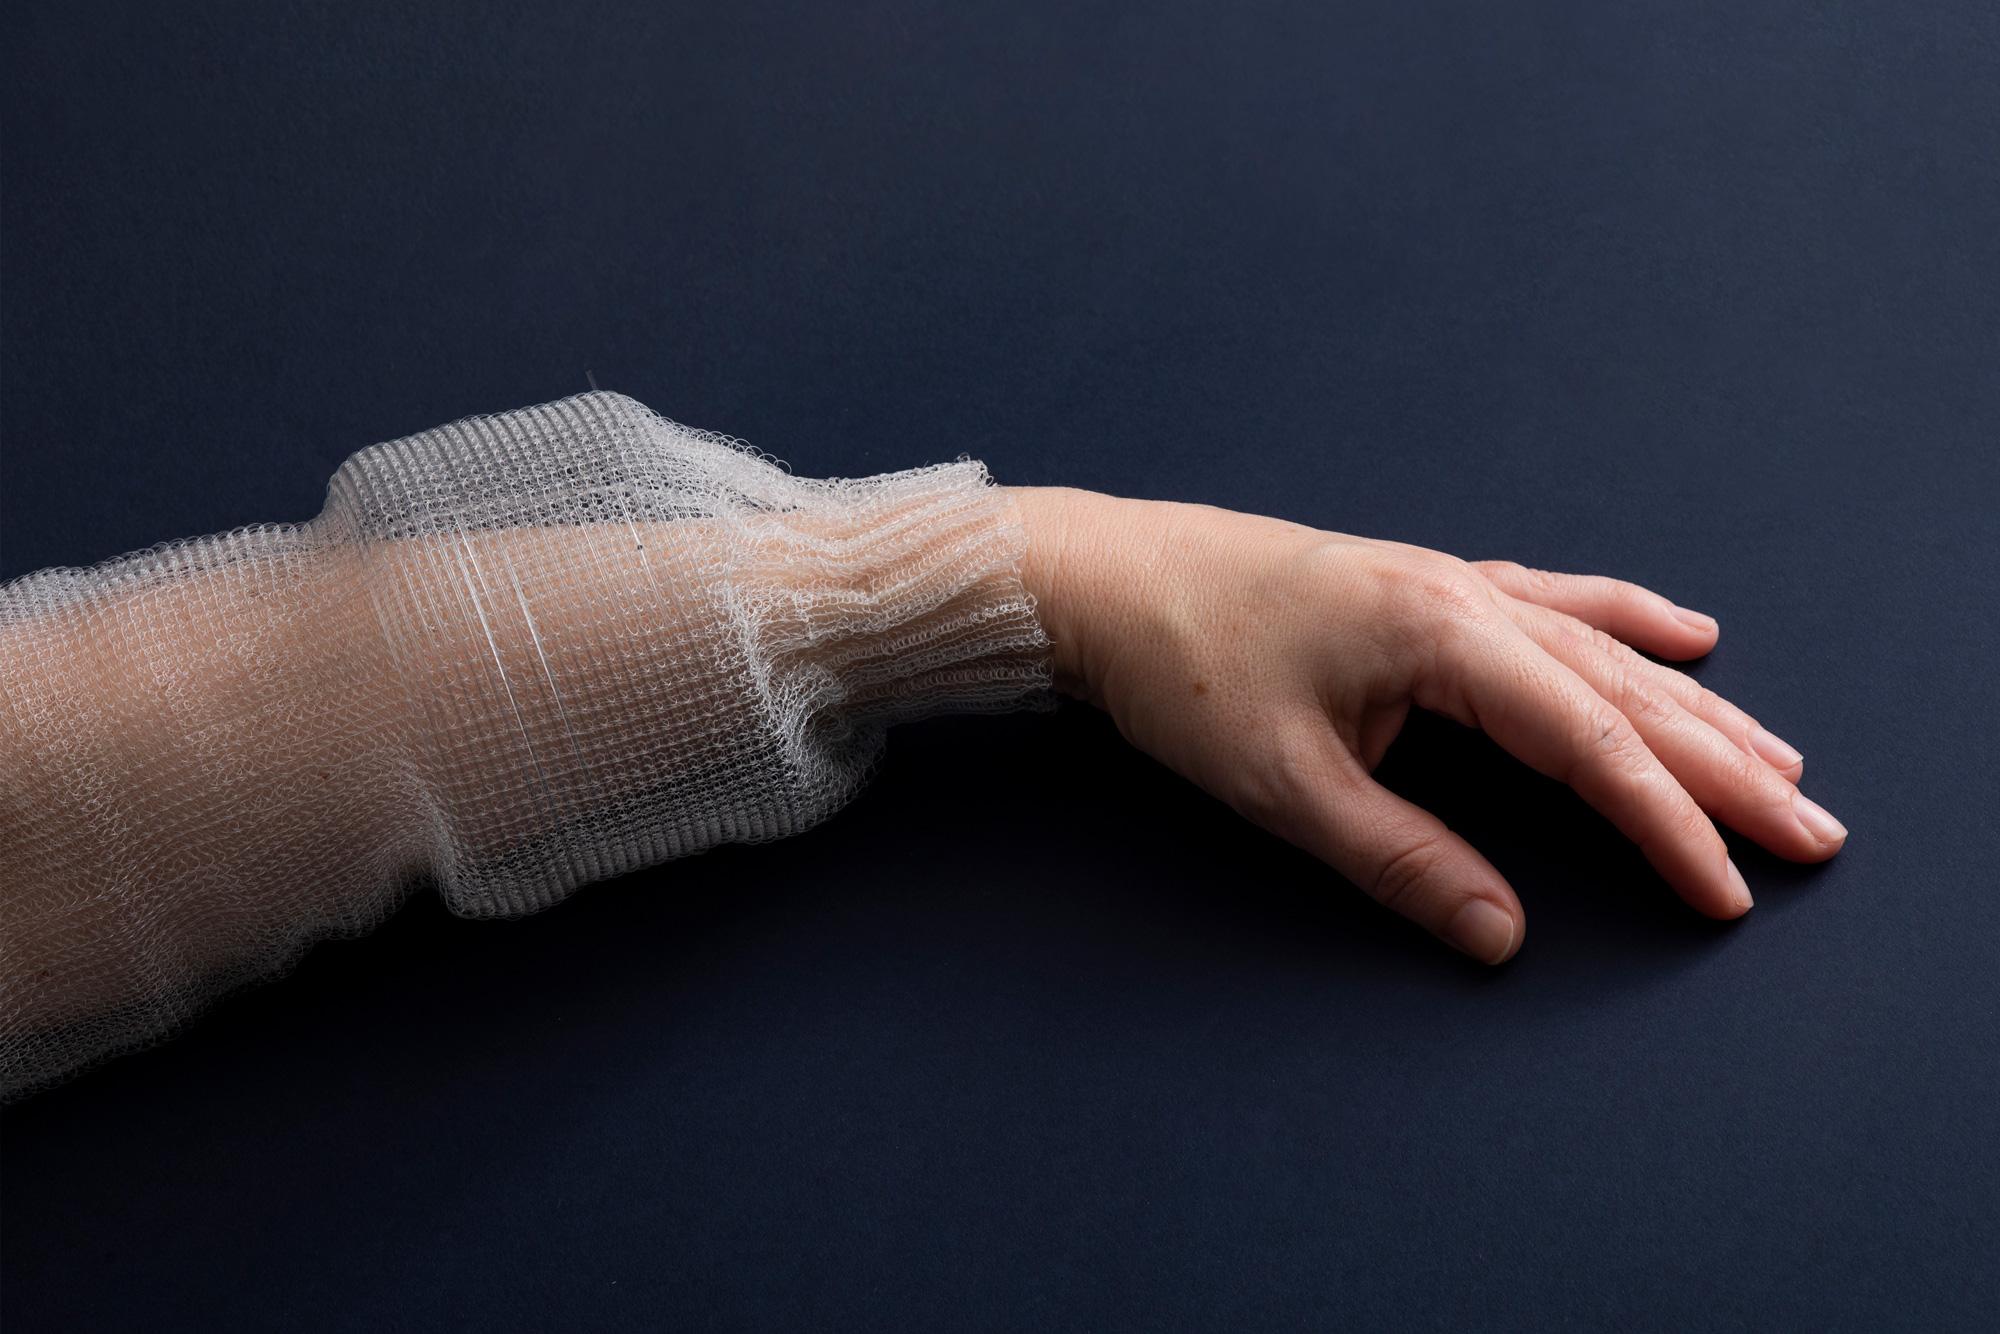 MIT Engineers Showcases A Programmable Digital Fiber Featuring Memory Unit, Sensors & AI